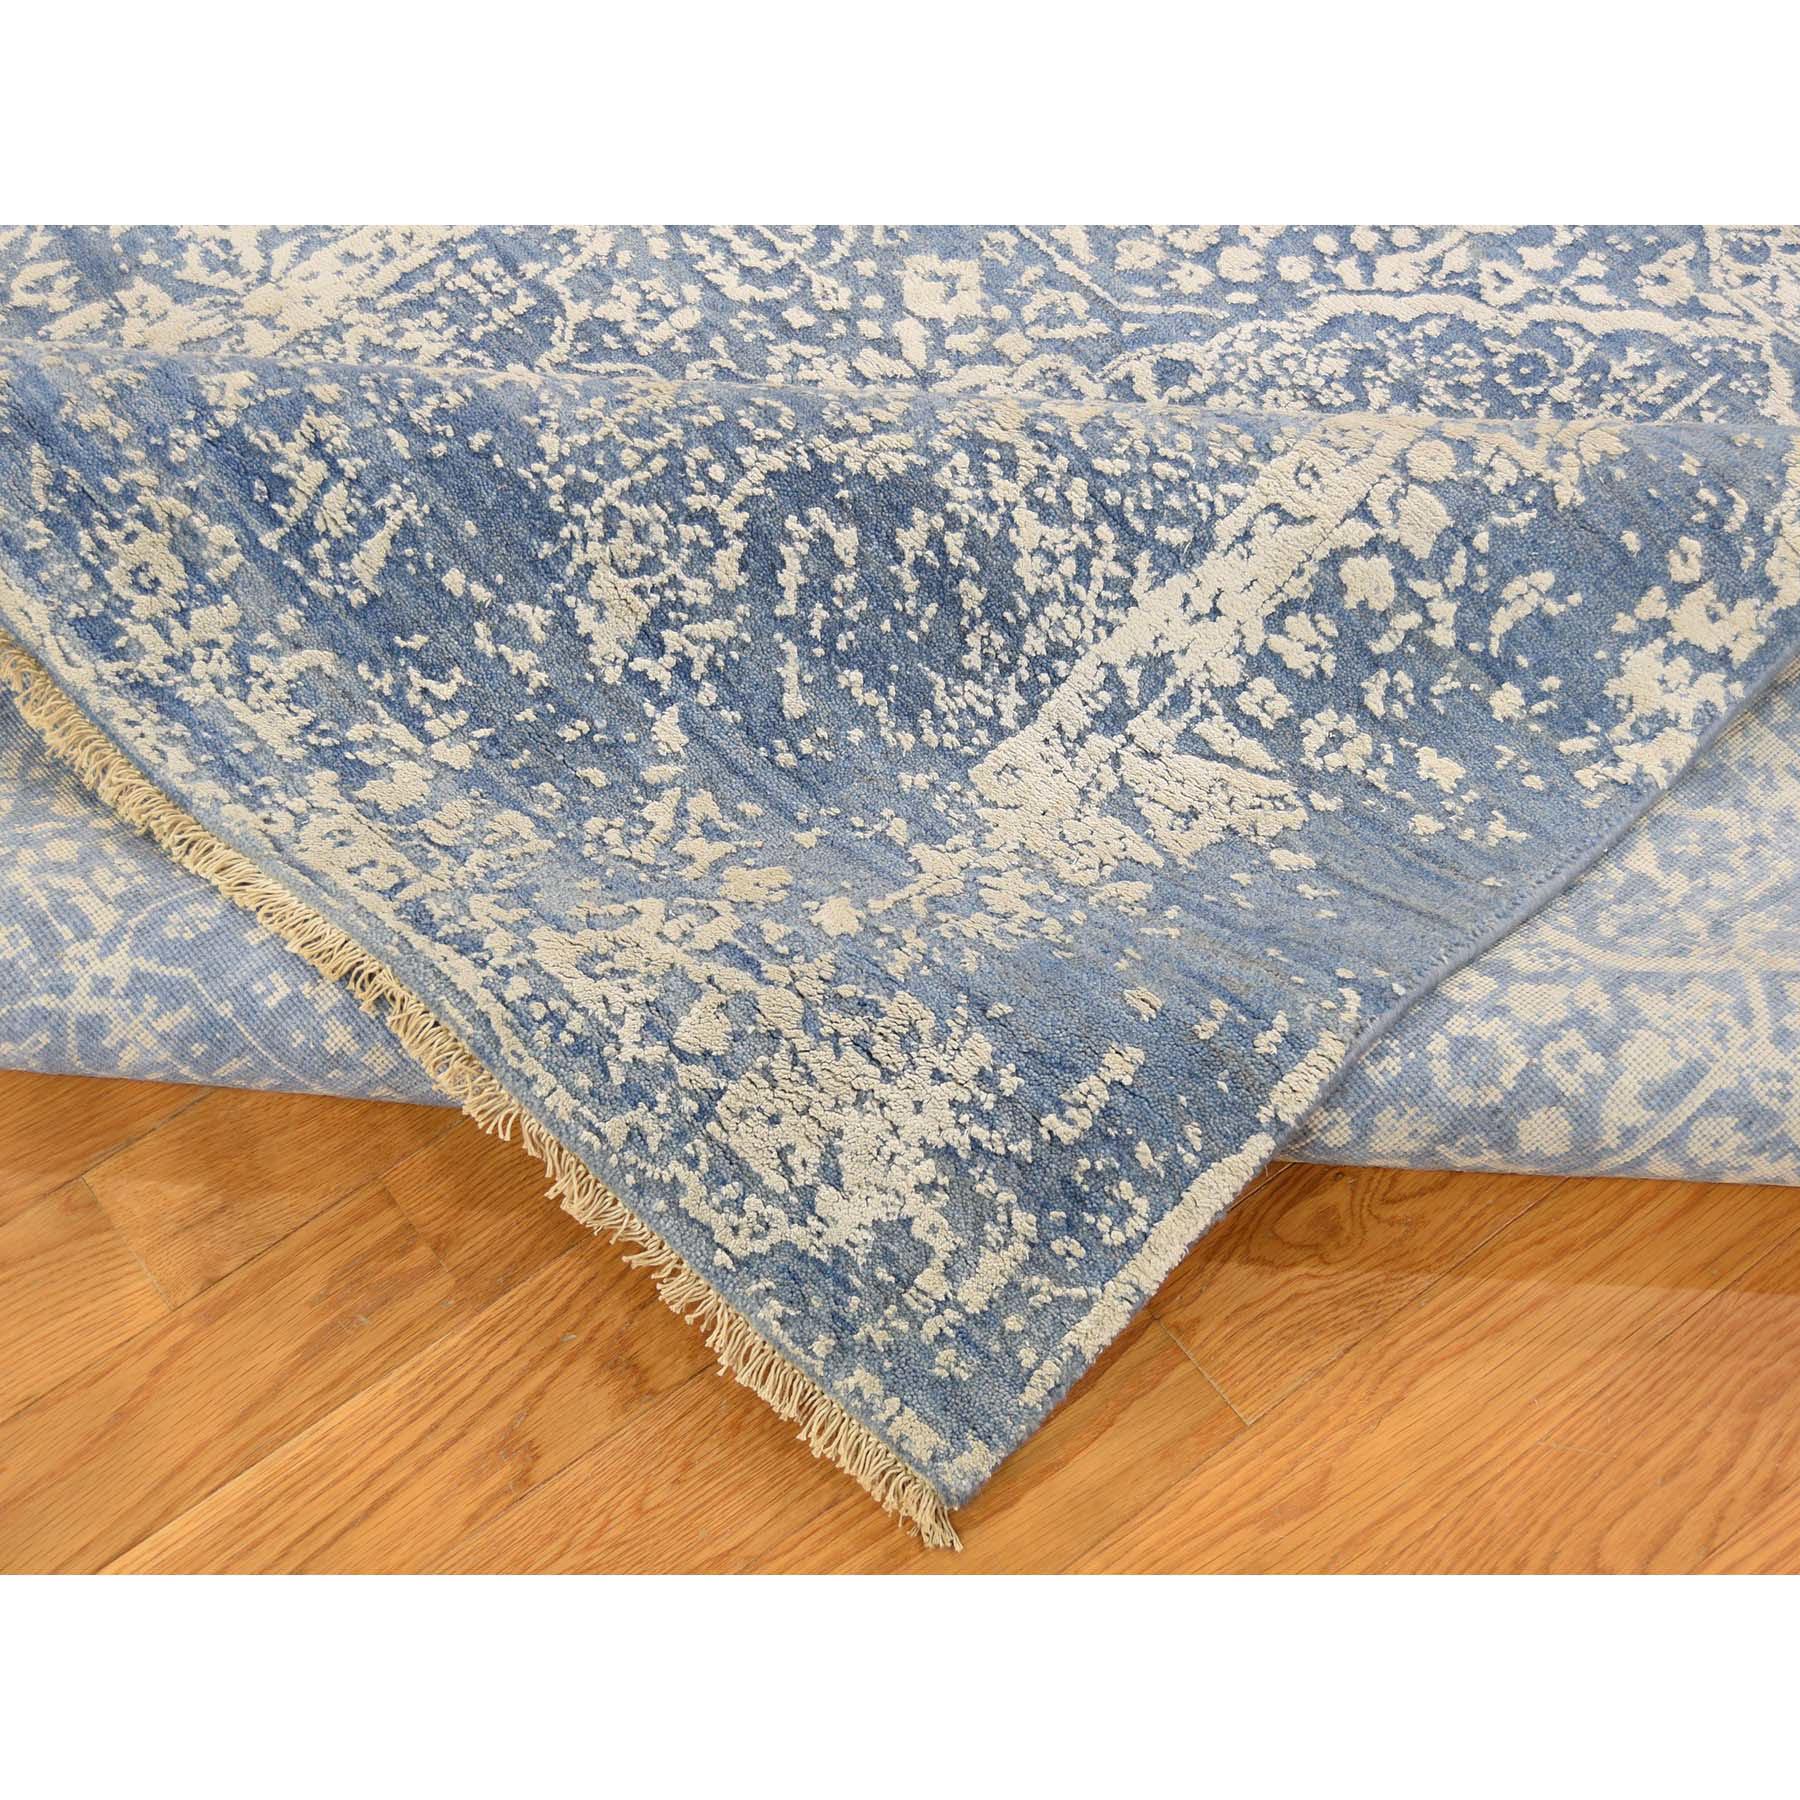 5-1--x7- Denim Blue Wool and Silk Hand-Knotted Broken Persian Design Rug